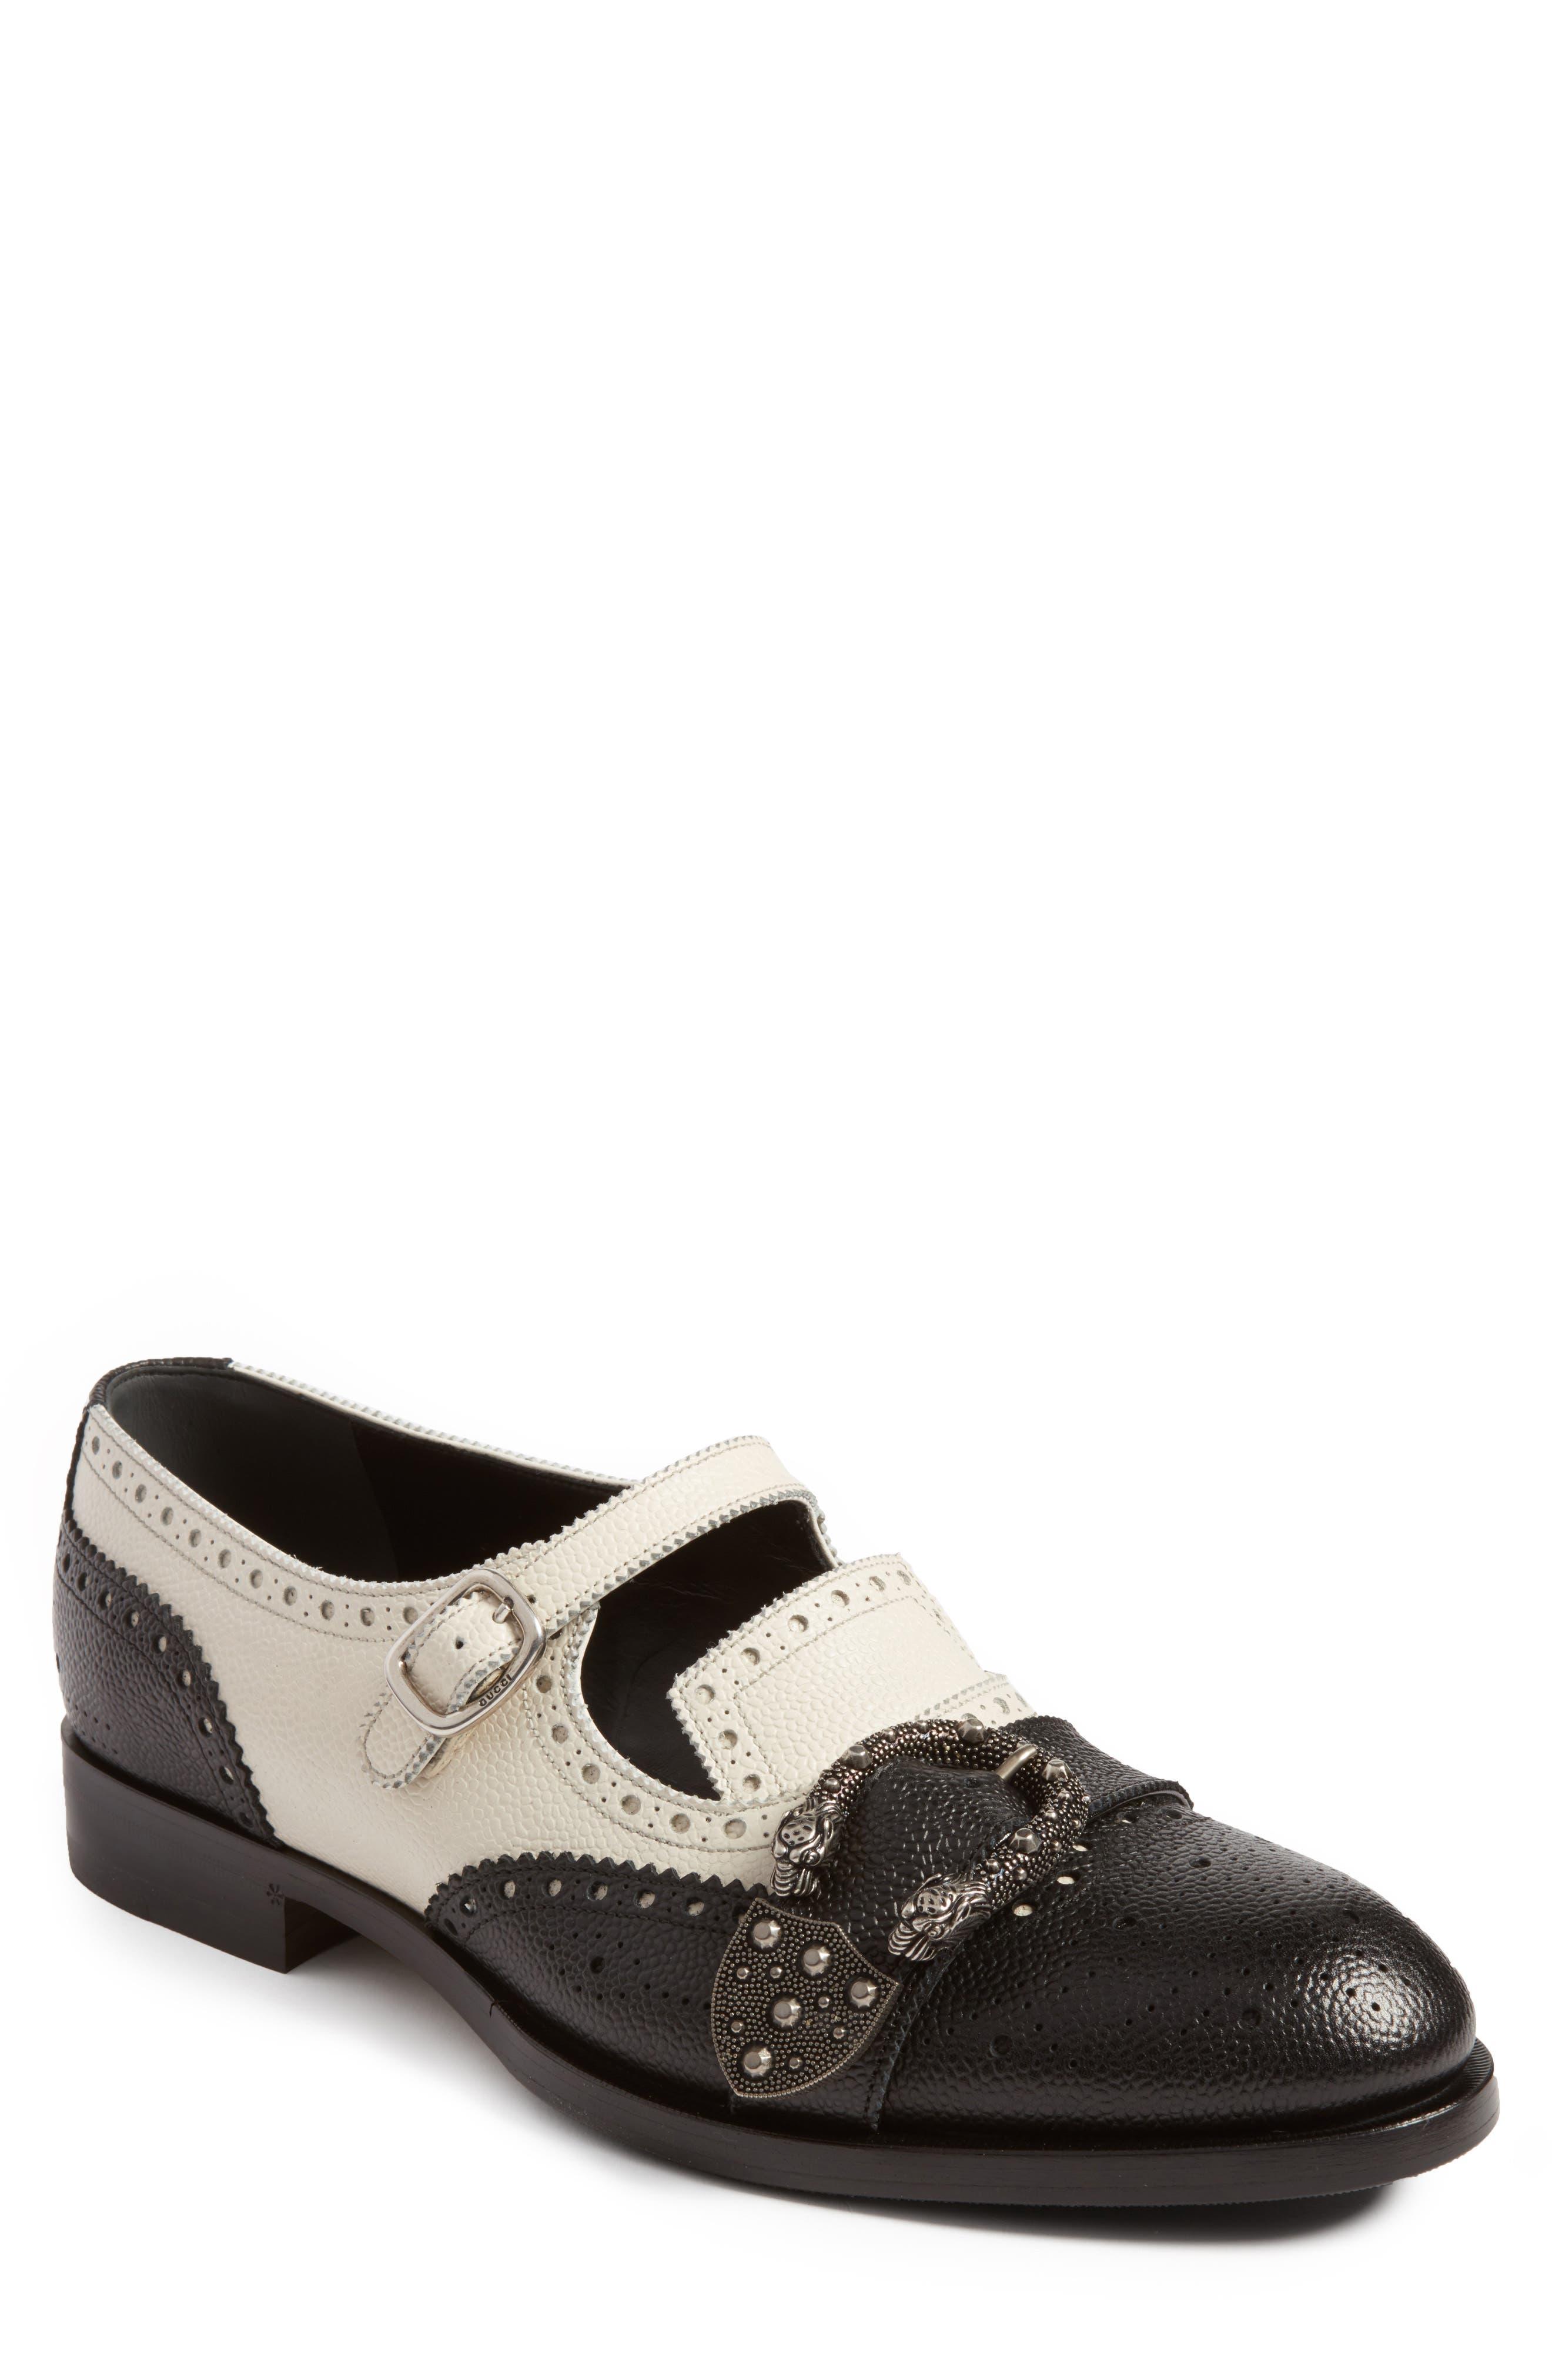 Queercore Brogue Monk Shoe,                         Main,                         color, Black White Multi